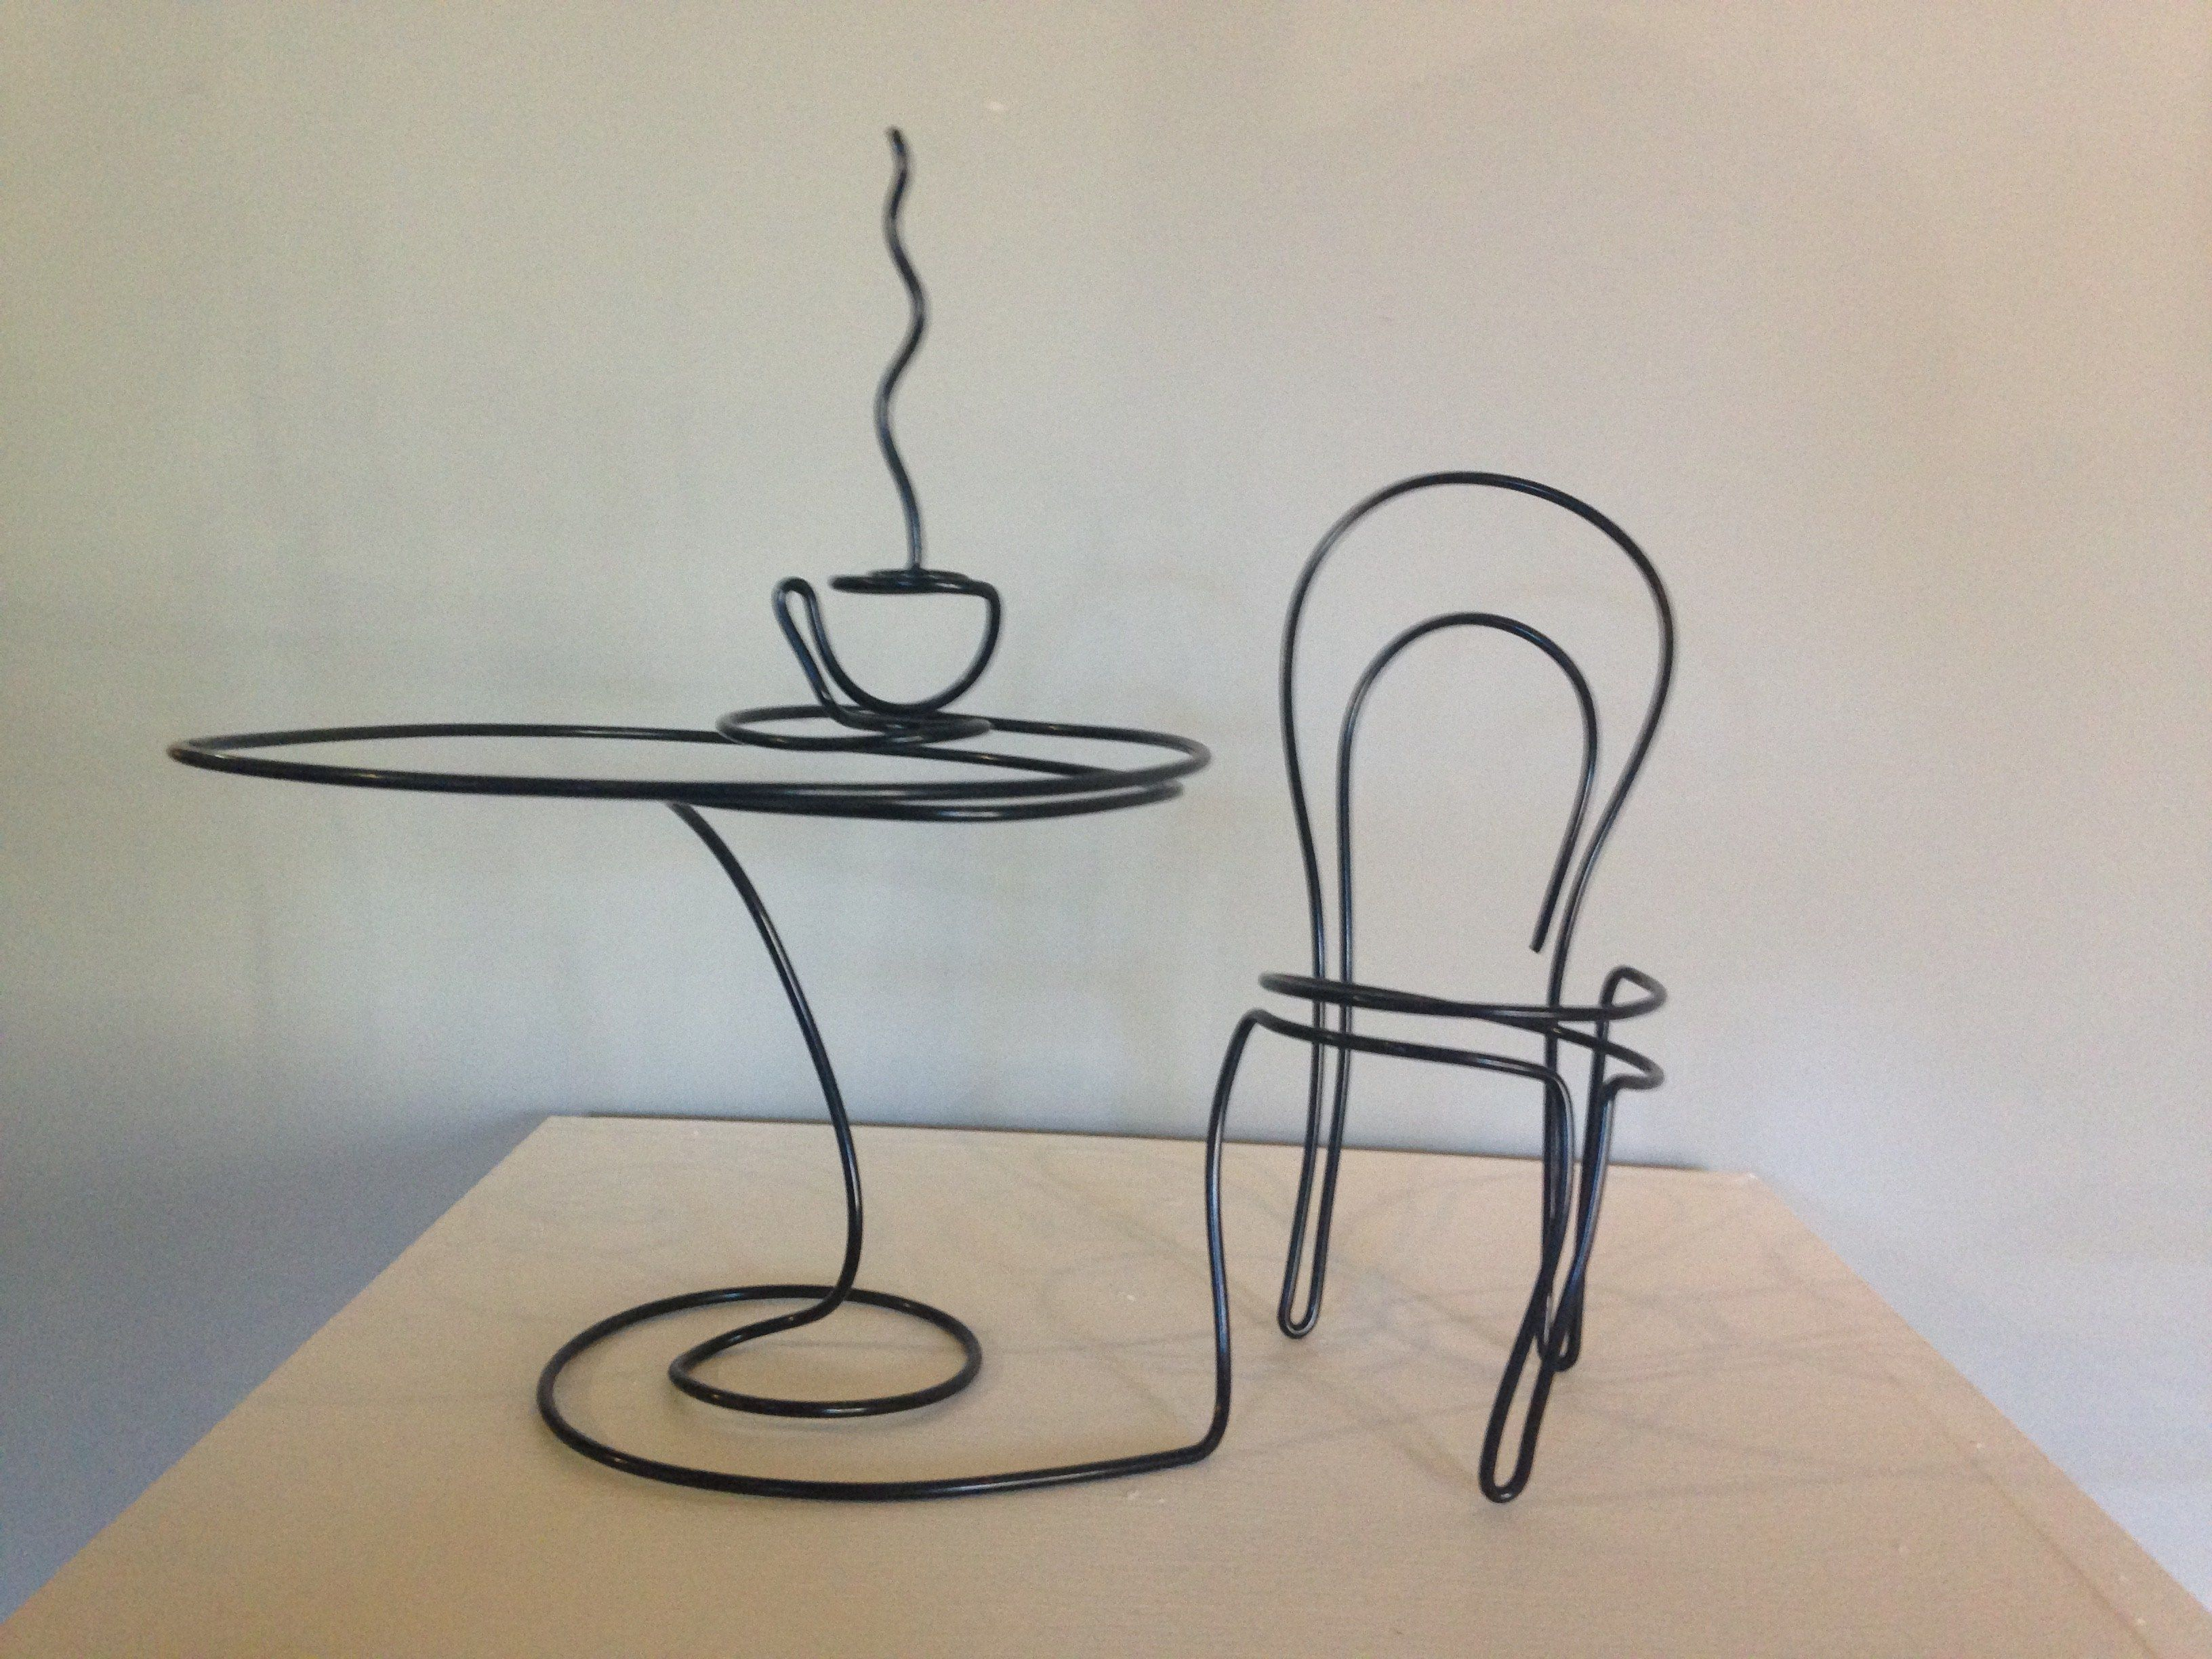 IMG_2761 | Fil de fer | Pinterest | Wire art and Galleries